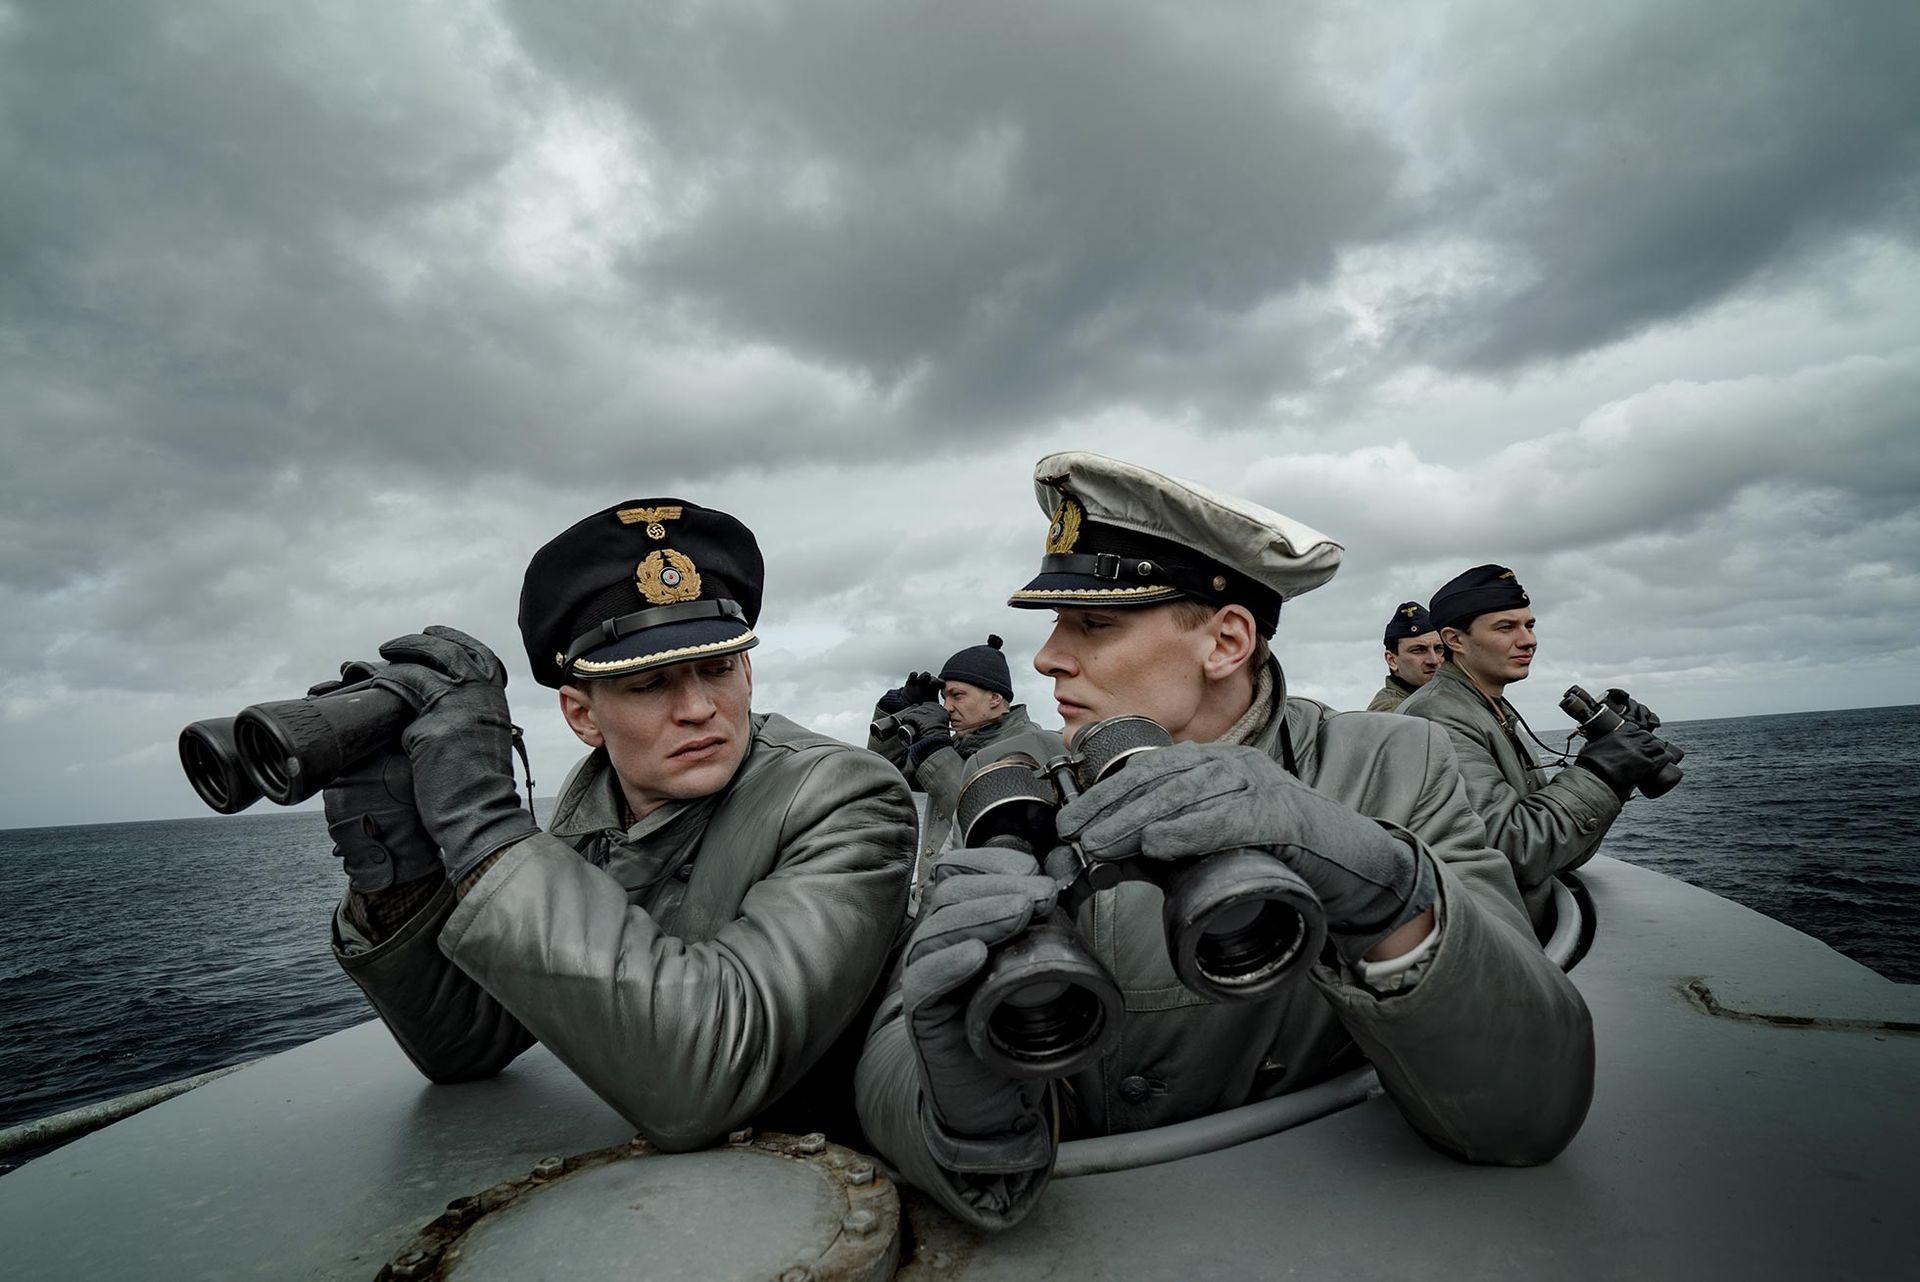 Nu kommer tv-serien Das Boot